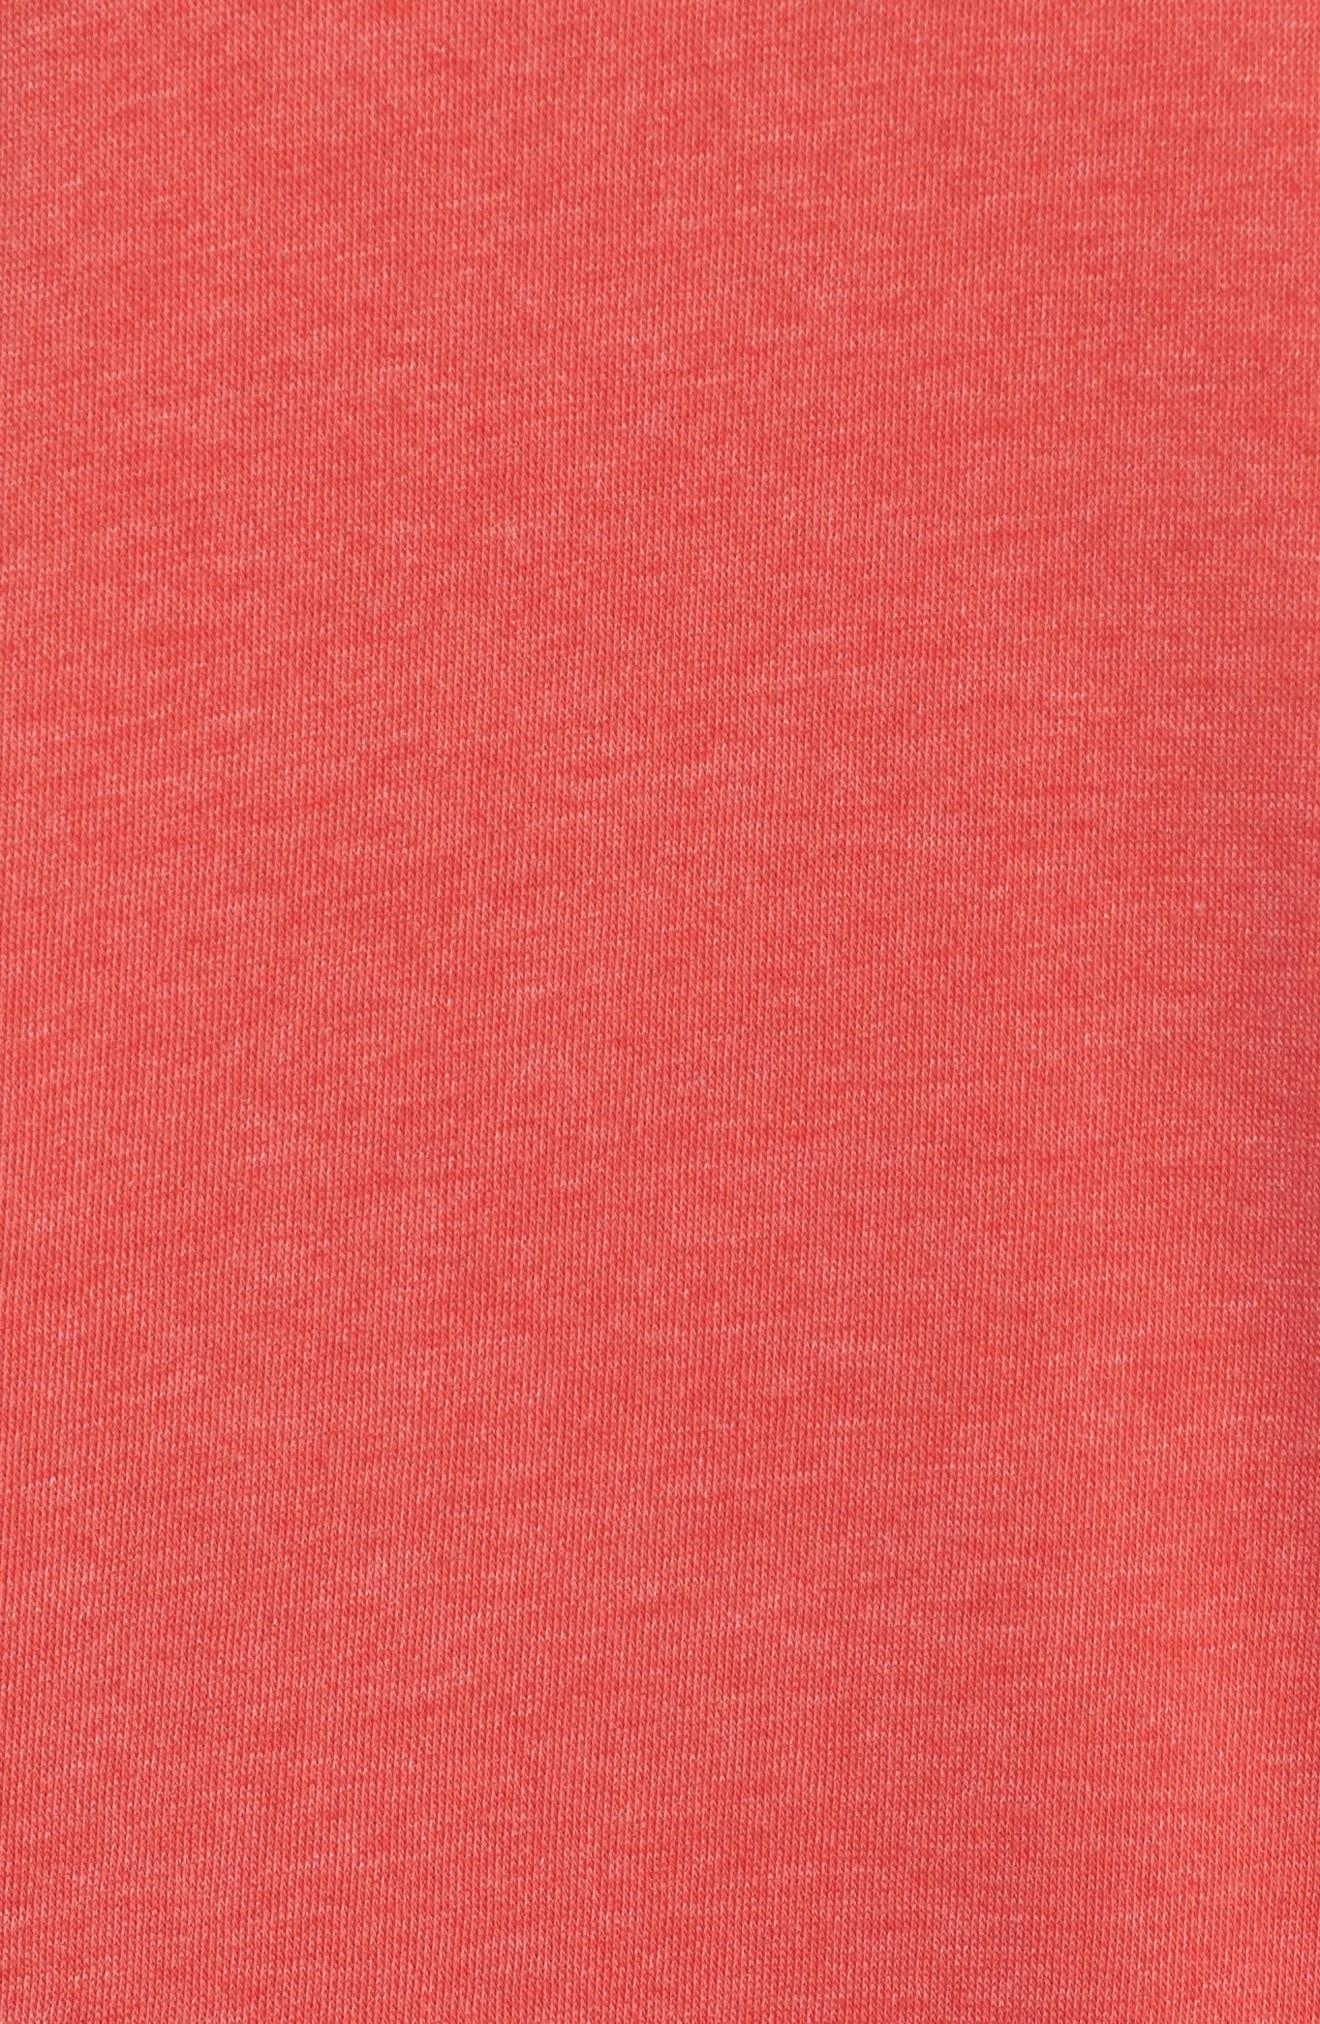 Lounge Sweatshirt Dress,                             Alternate thumbnail 5, color,                             Love Red/ White